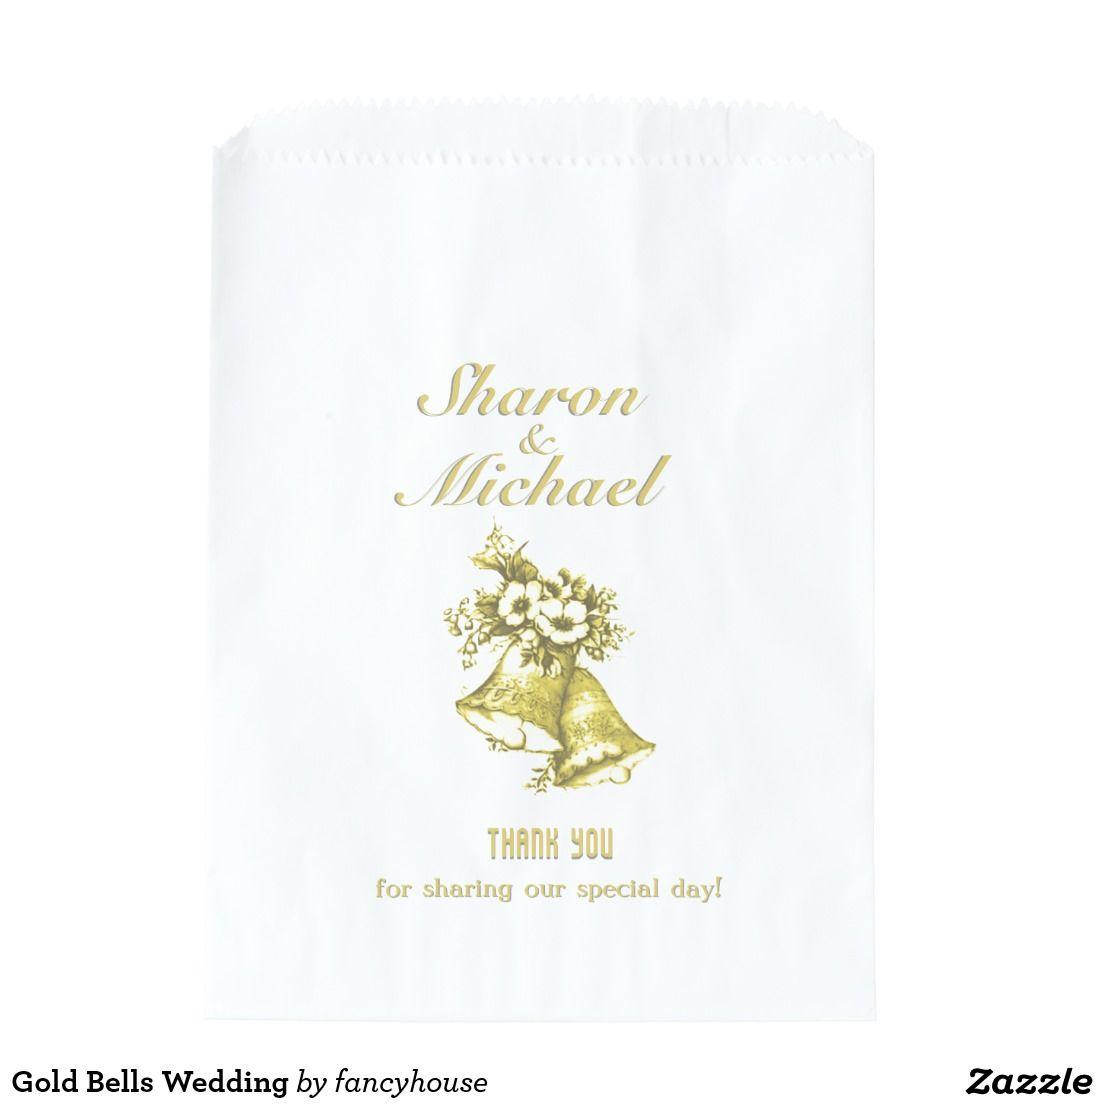 Gold Bells Wedding Favor Bag | Wedding favor bags, Favor bags and Favors